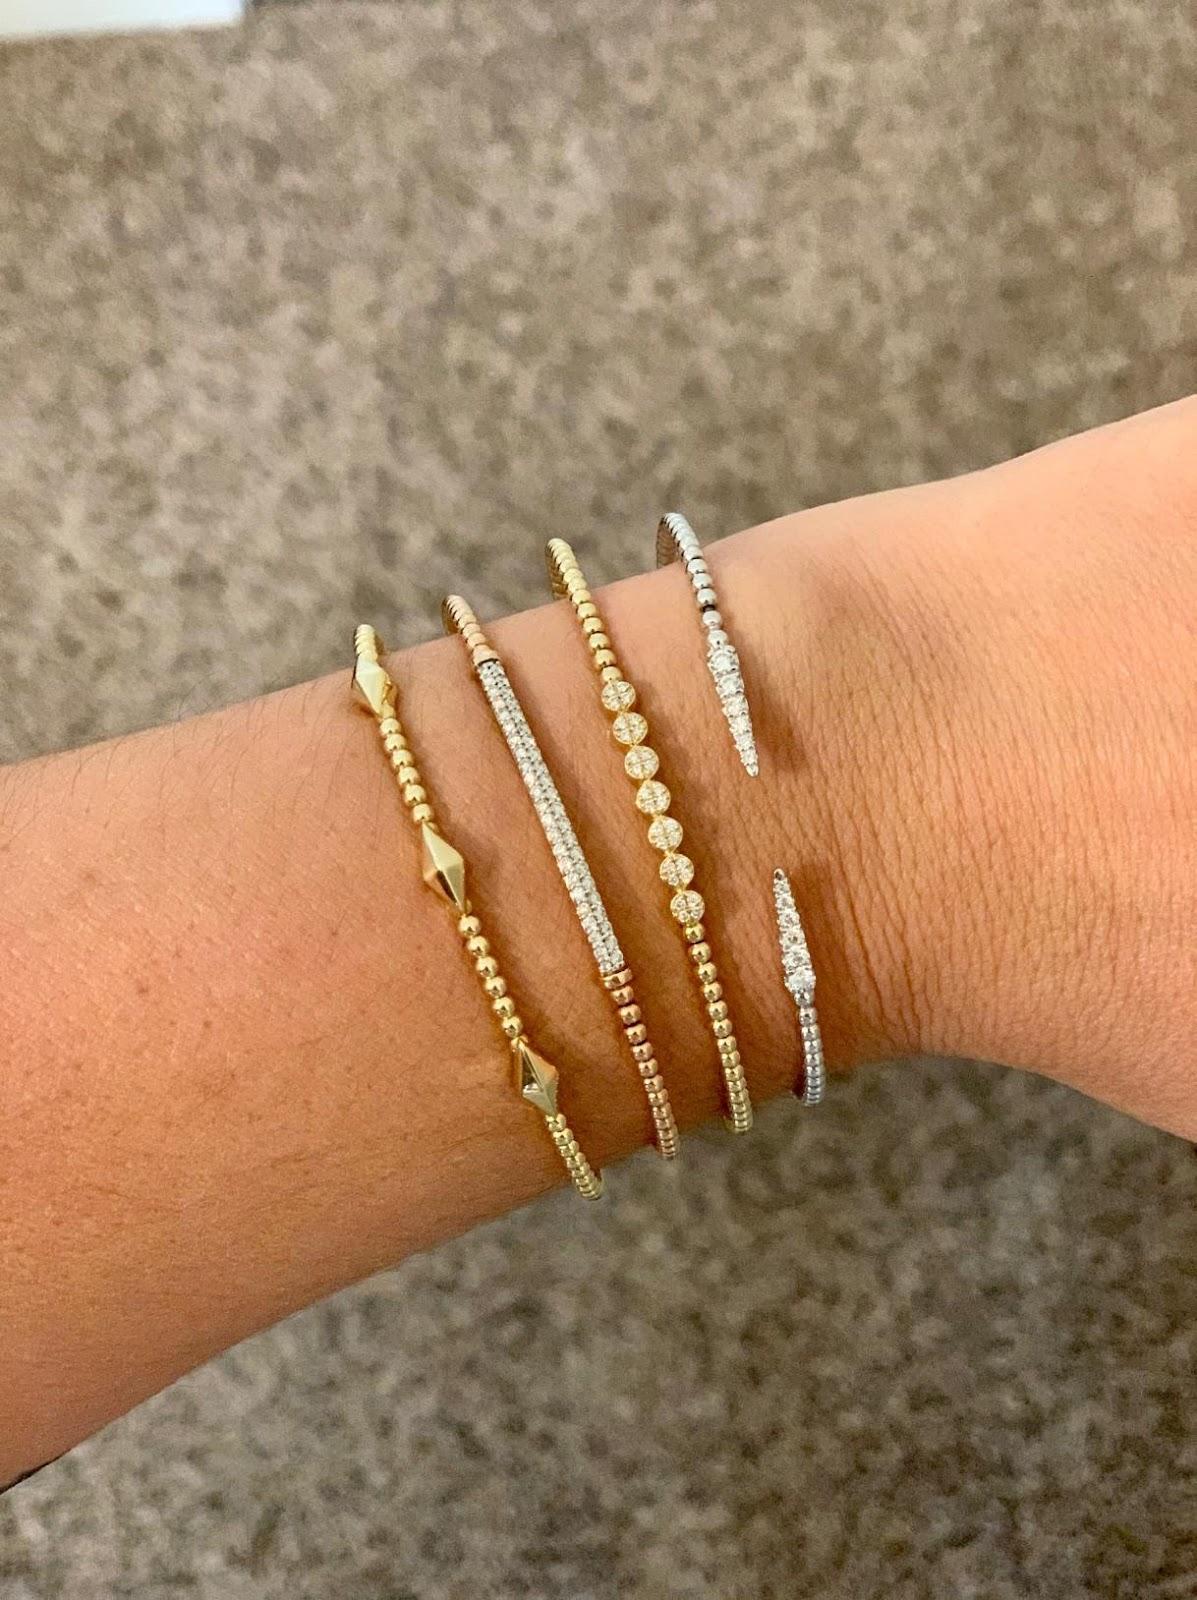 bujukan bracelets